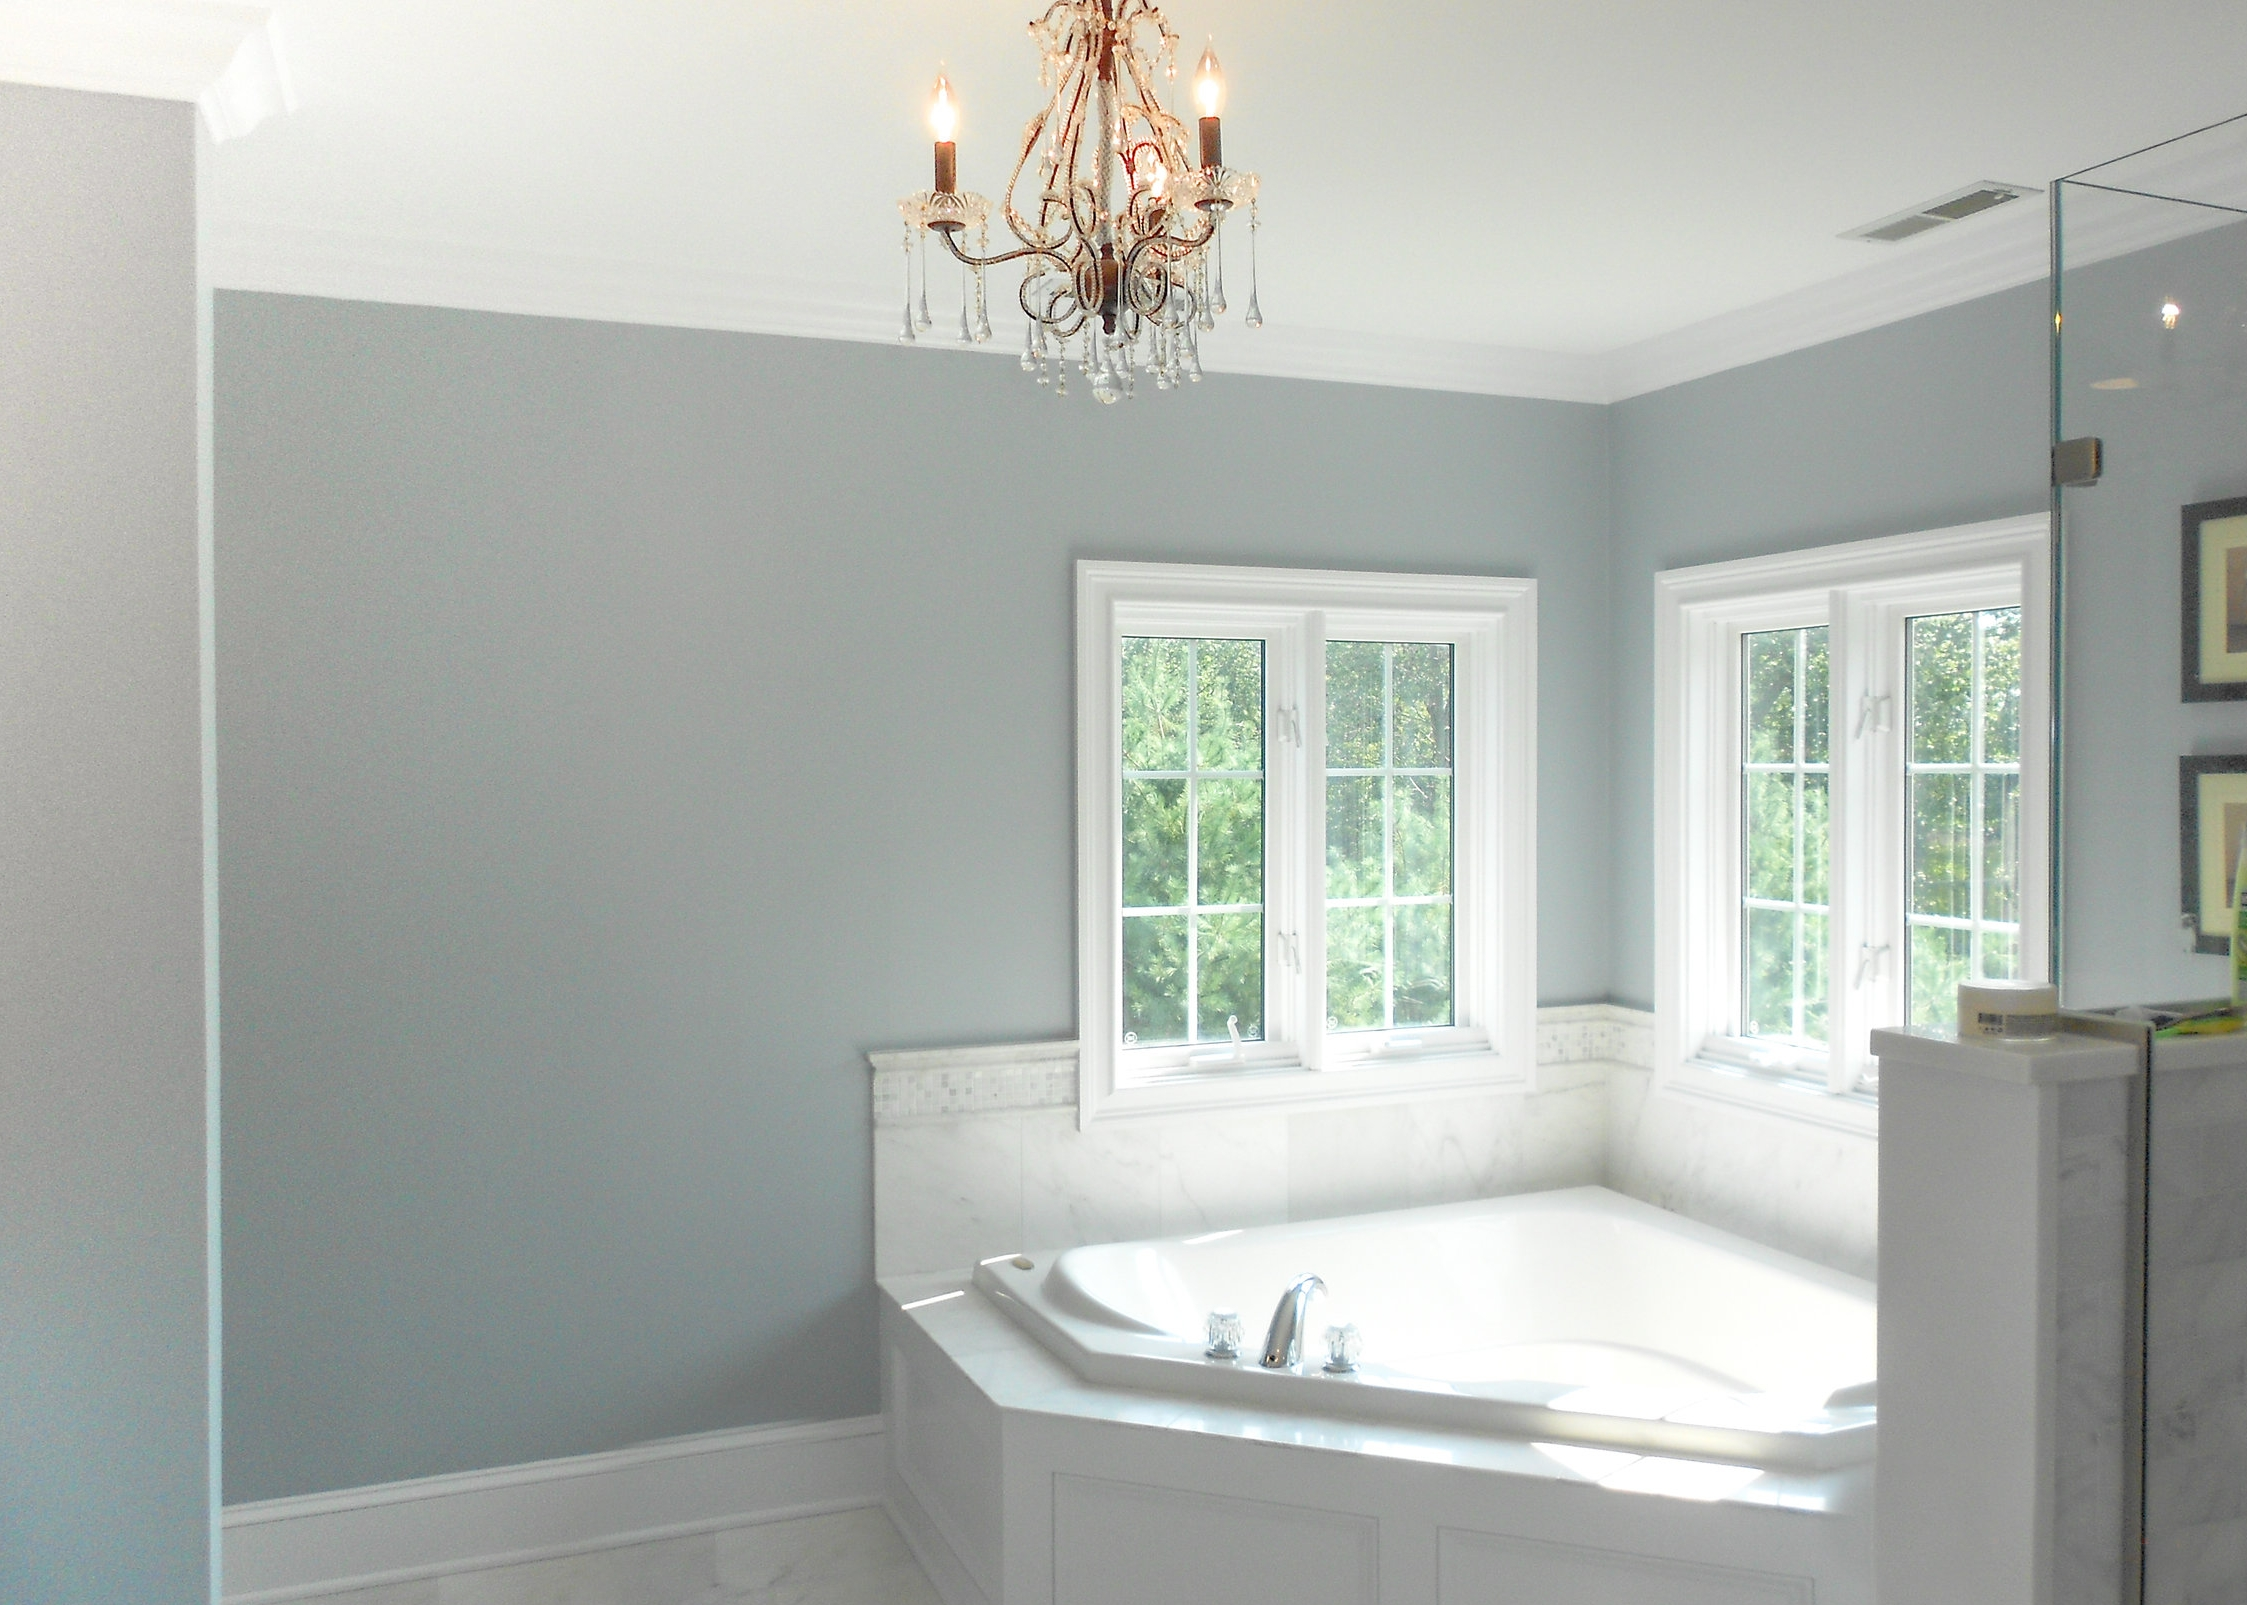 bathroom-jacuzzi-tub.jpg